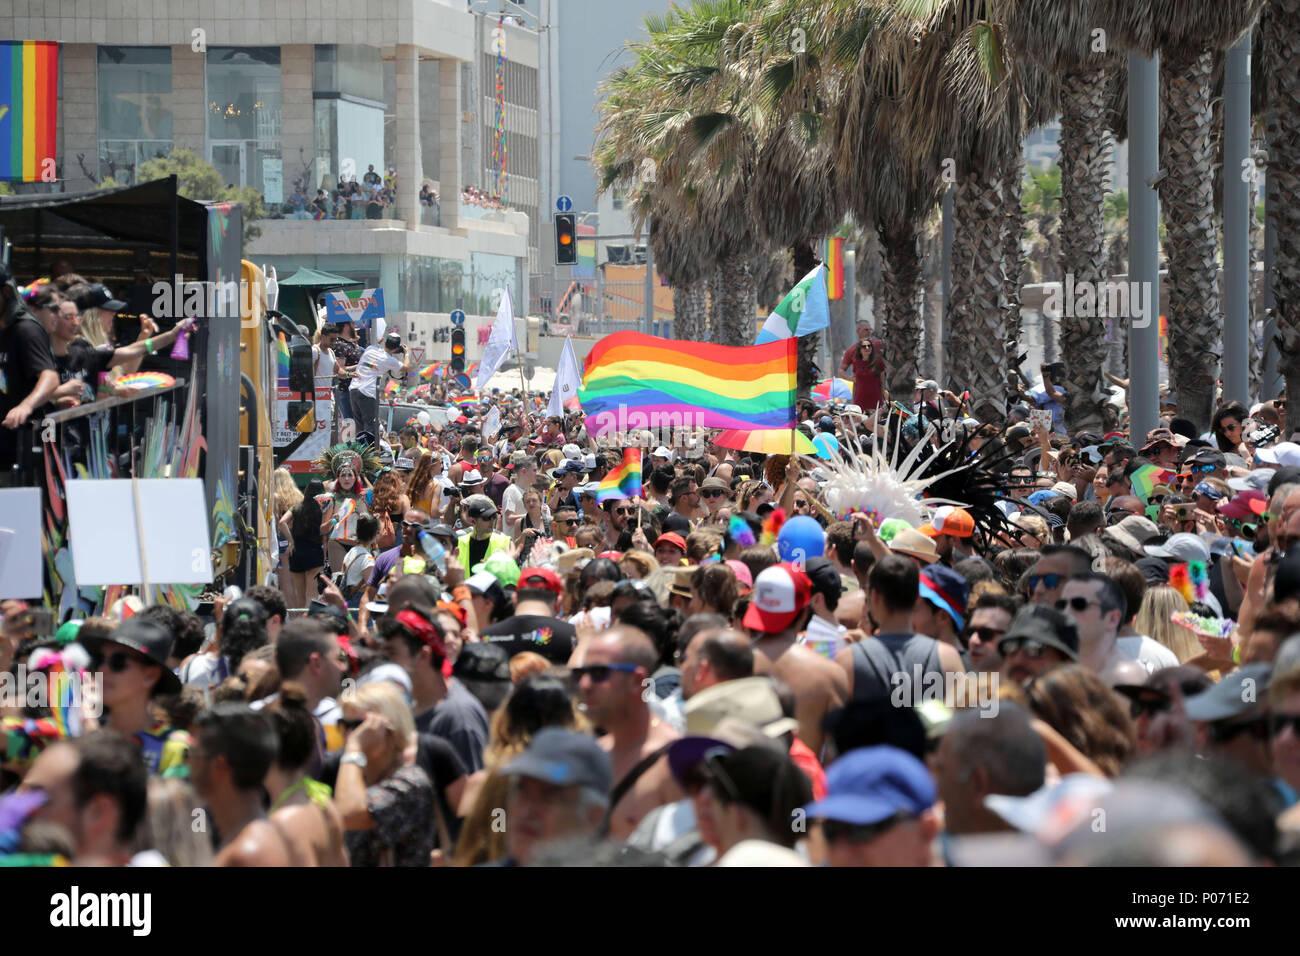 Tel Aviv, Israel. 8th June, 2018. People participate in the pride parade in Tel Aviv, Israel, on June 8, 2018. Credit: JINI/Gideon Marrkowicz/Xinhua/Alamy Live News - Stock Image